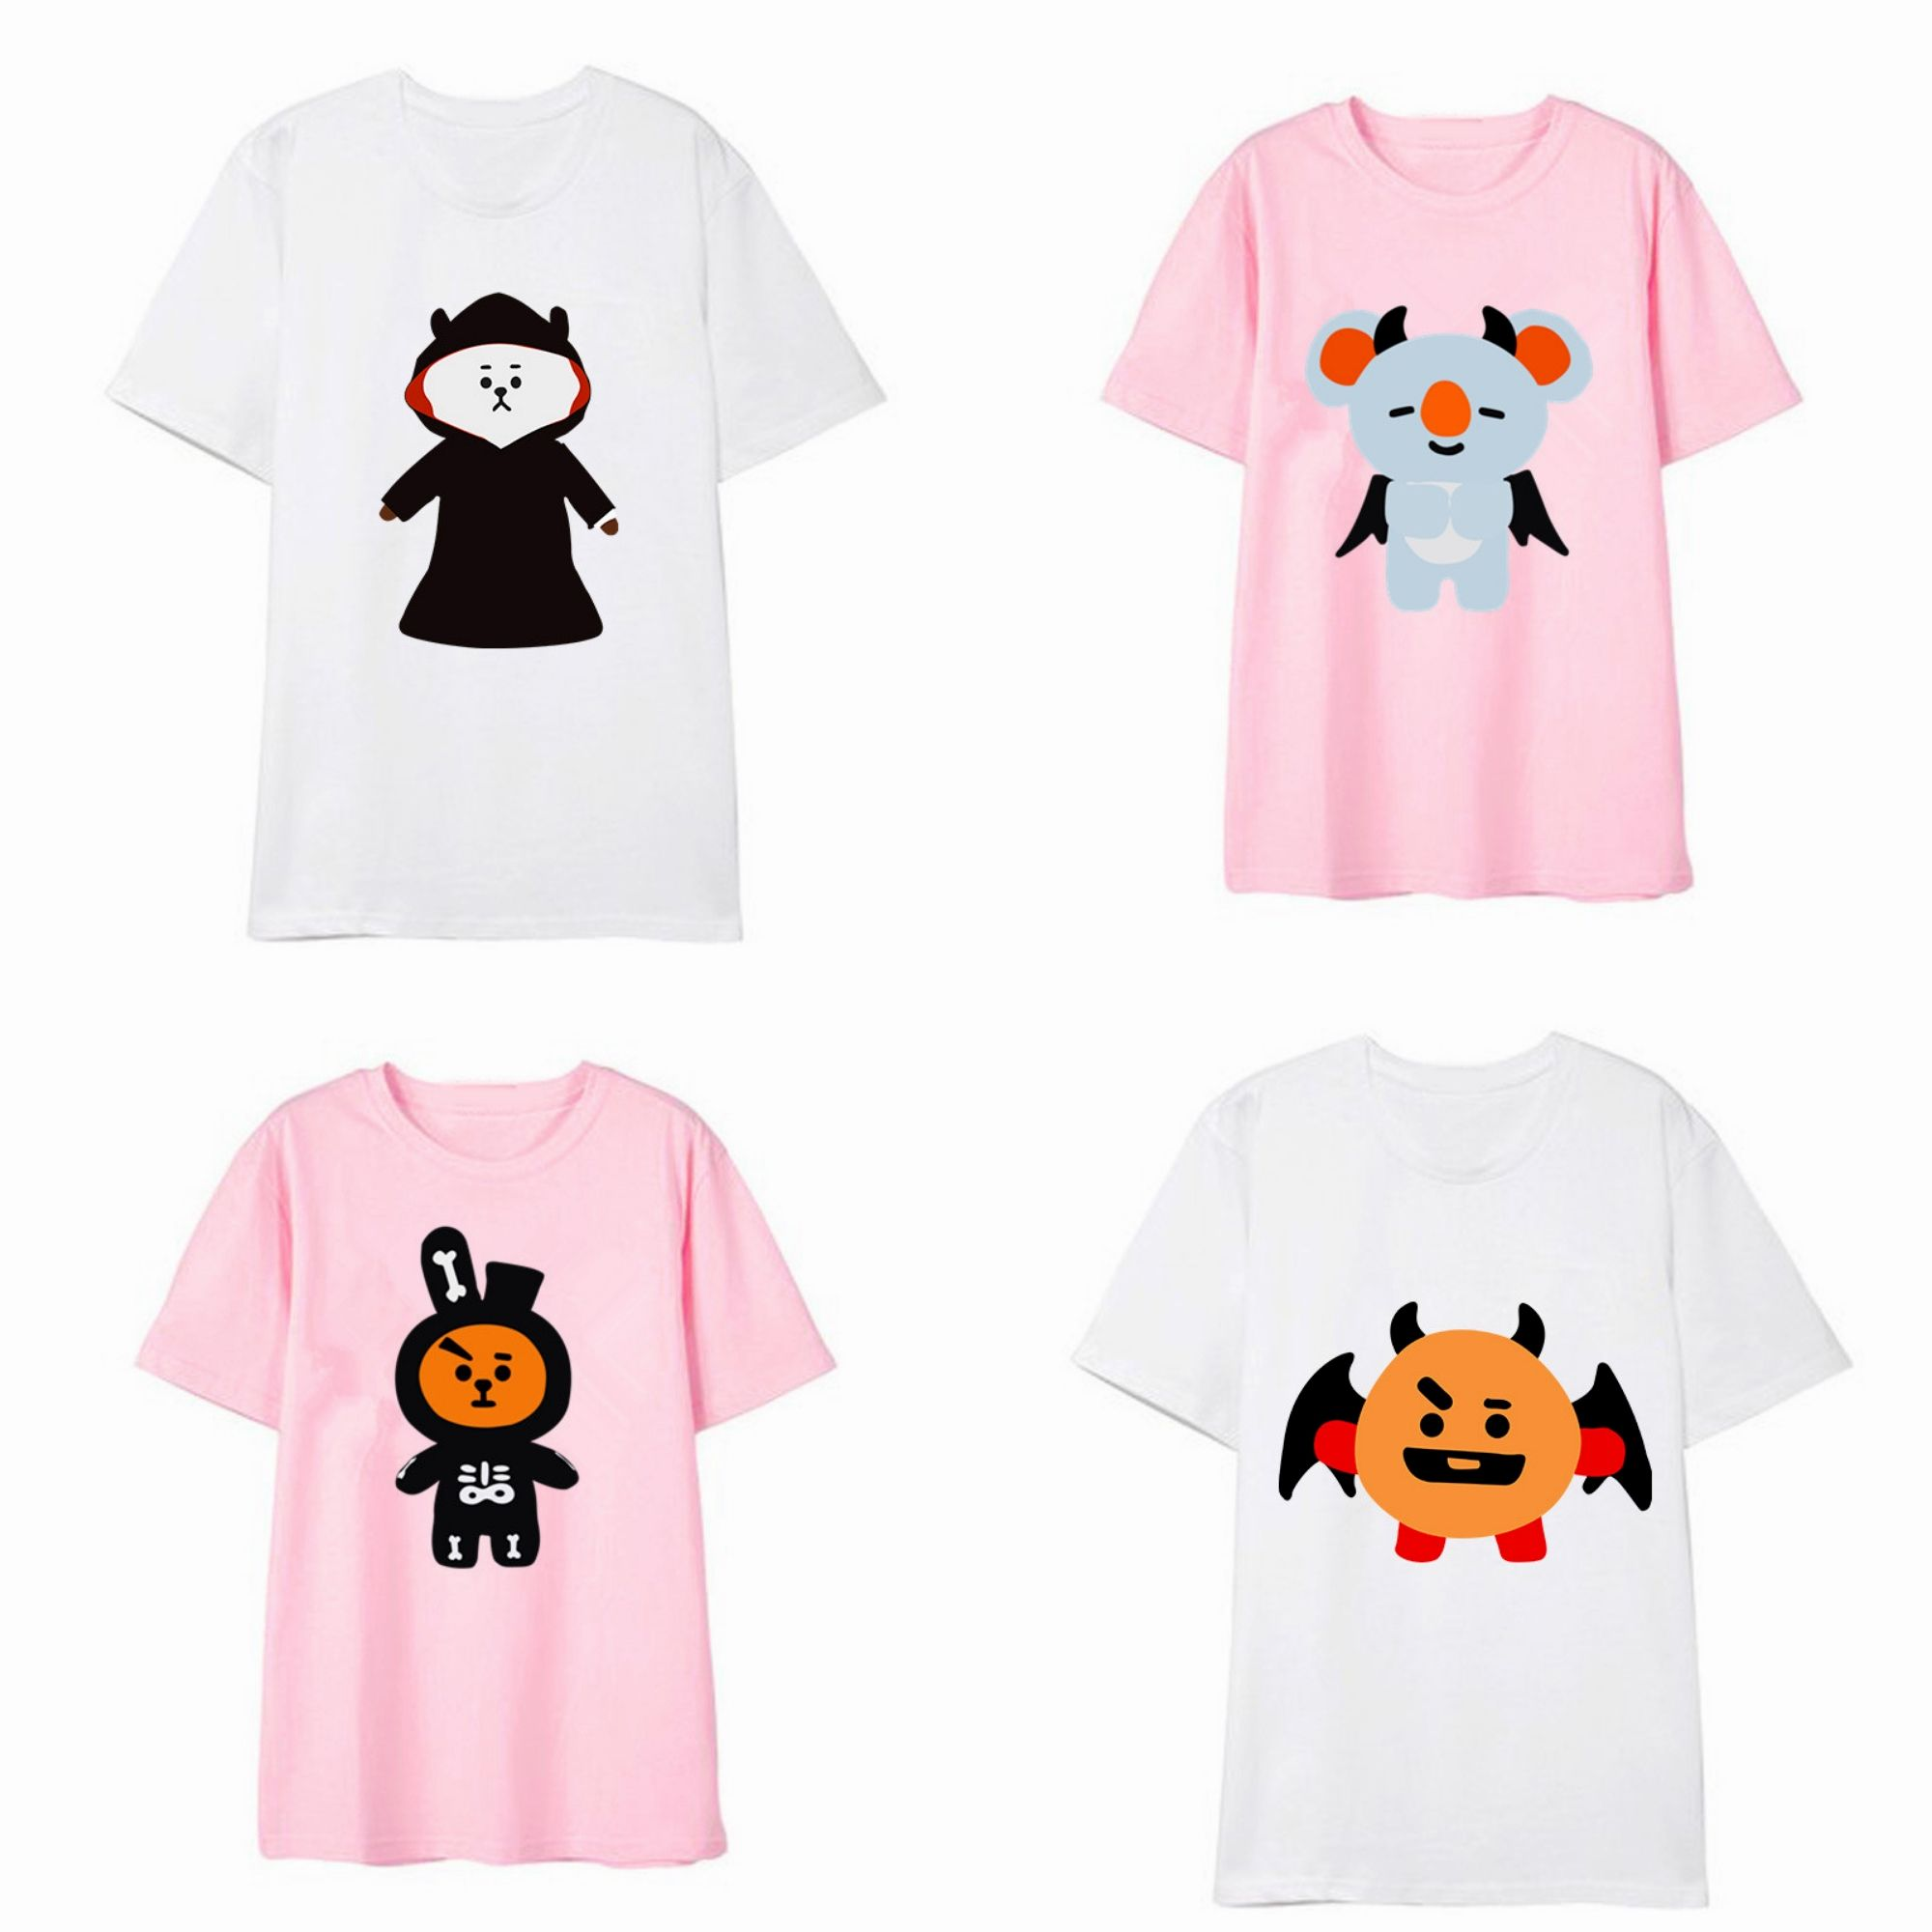 Bt21 Bts Merchandise Line Friends Store Line Friends Online Store Line Store Bt21 Merch Bt21 Bts Korean Fashion Online Store Kpop Merchandise Line Friends